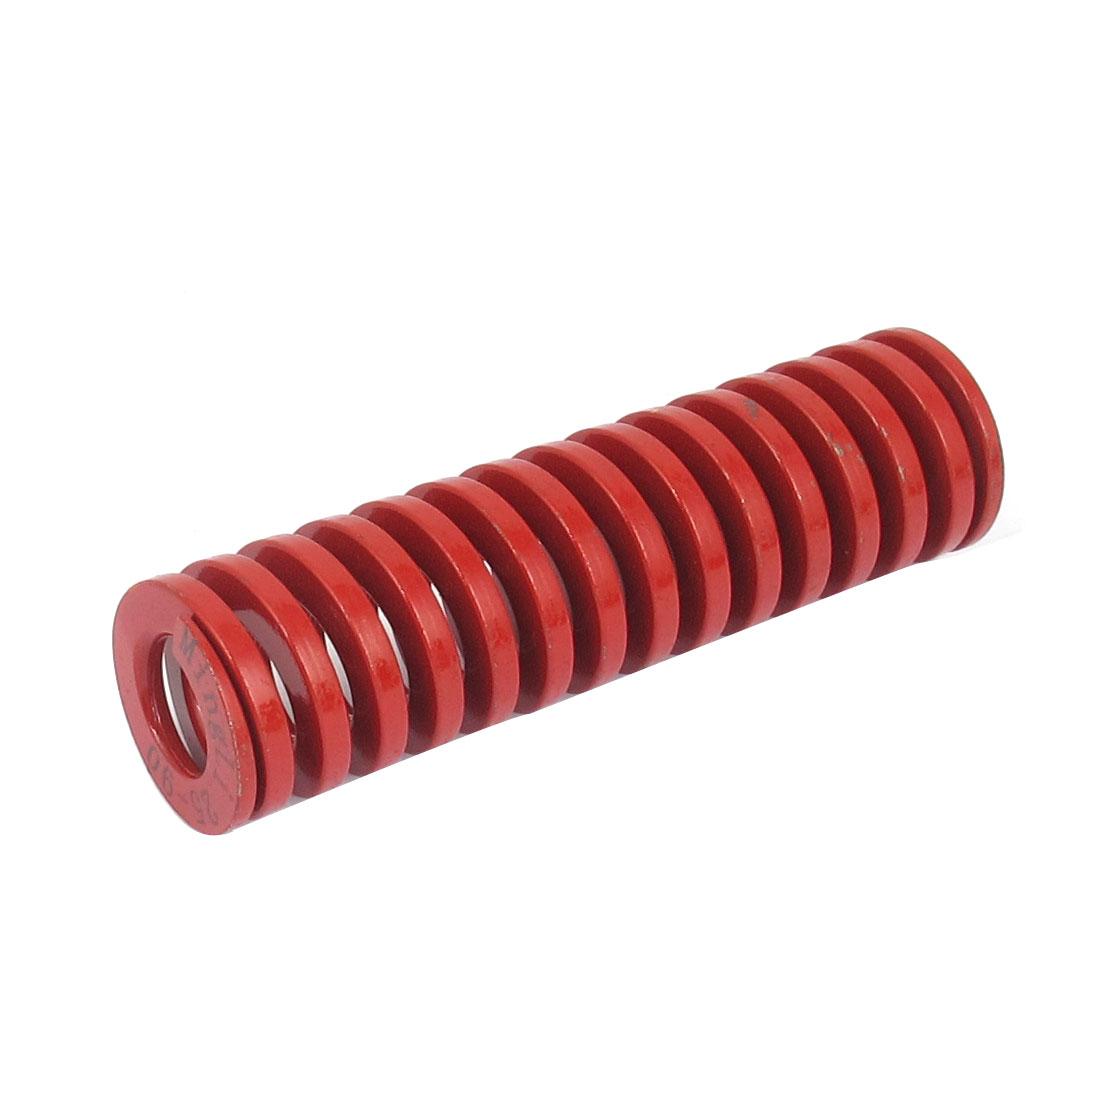 25mm OD 90mm Long Medium Load Spiral Stamping Compression Die Spring Red